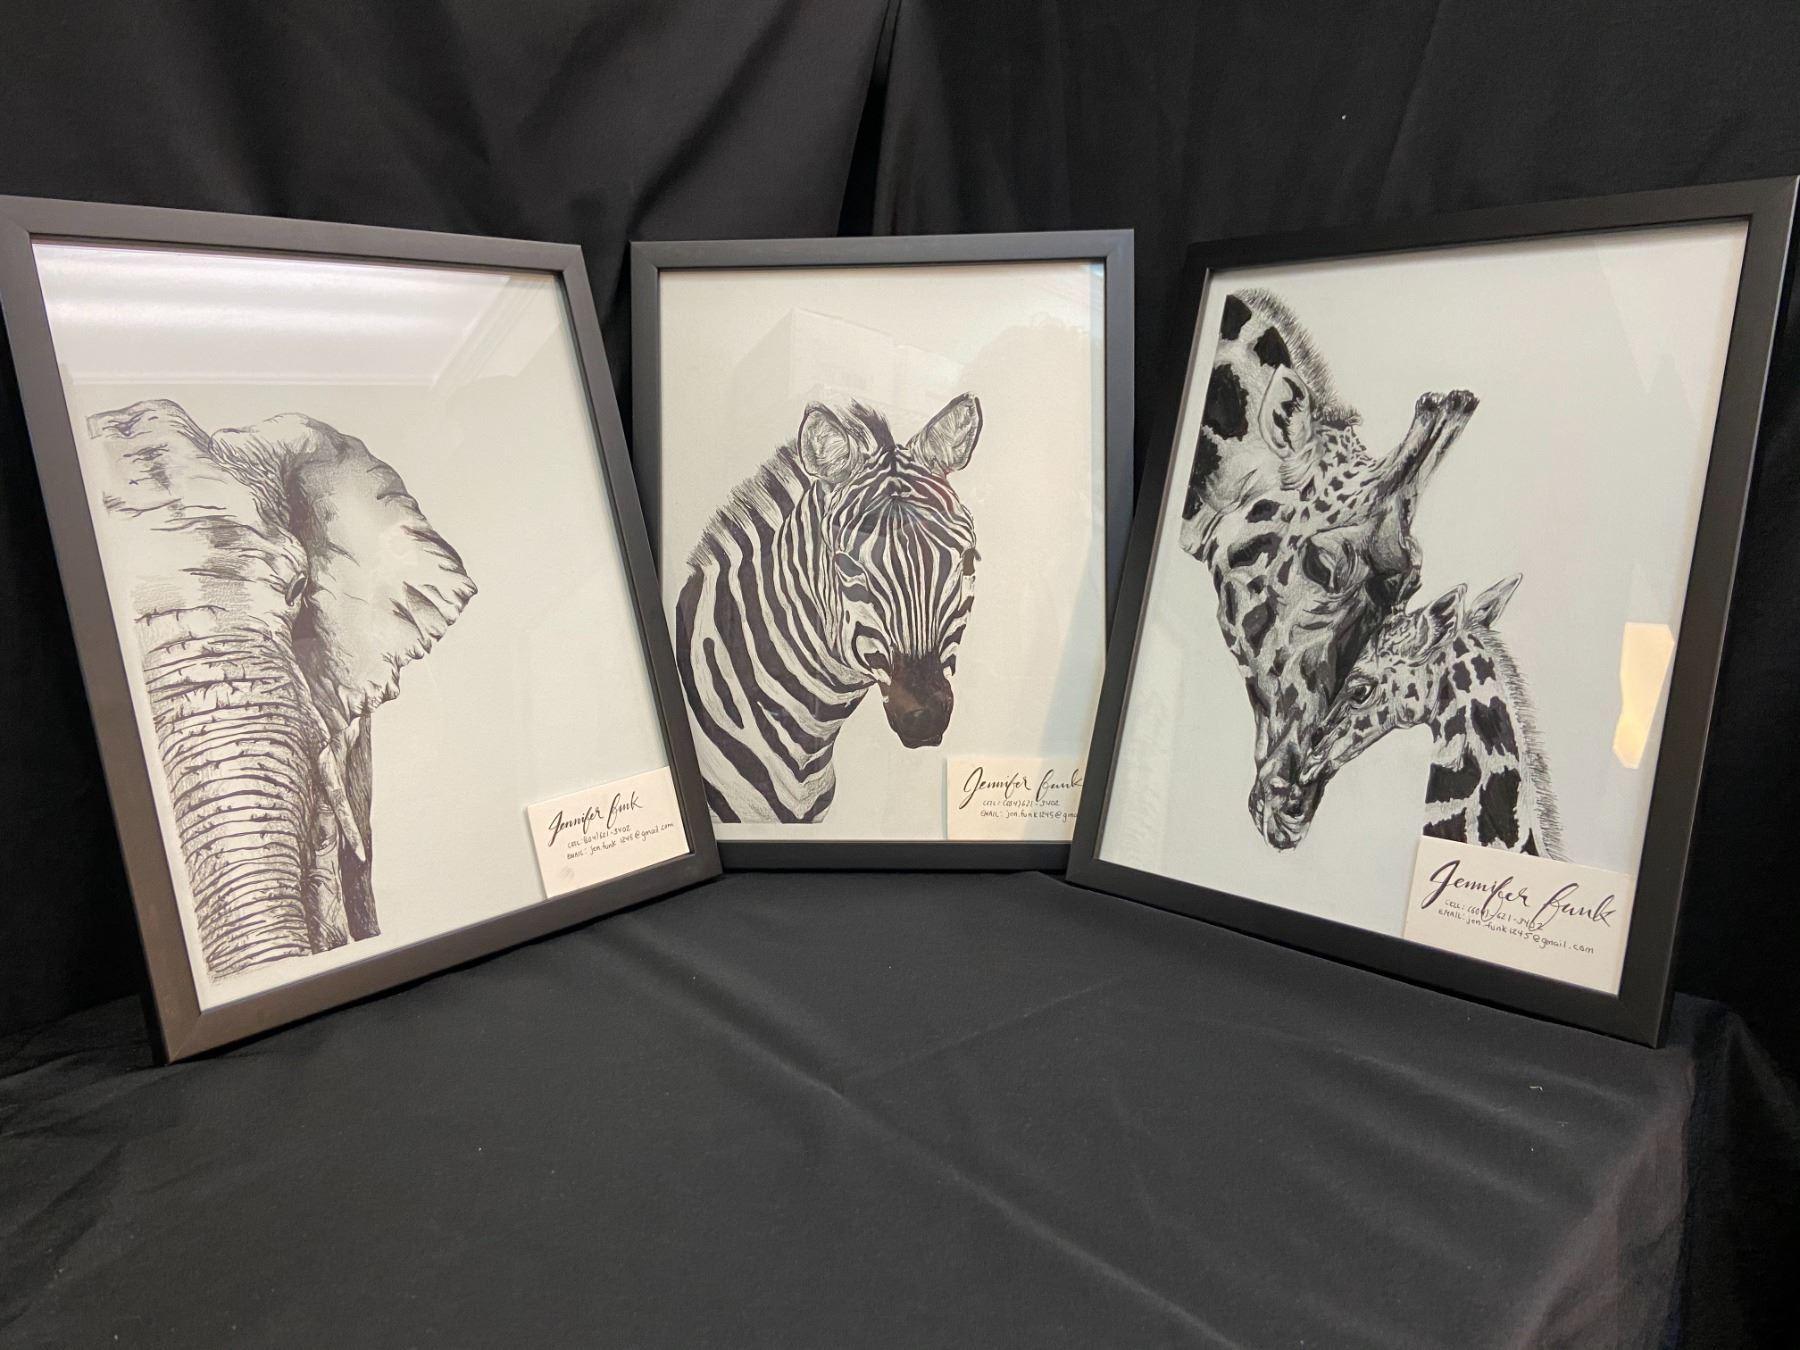 Set of 3 Original Framed African Animal Drawings